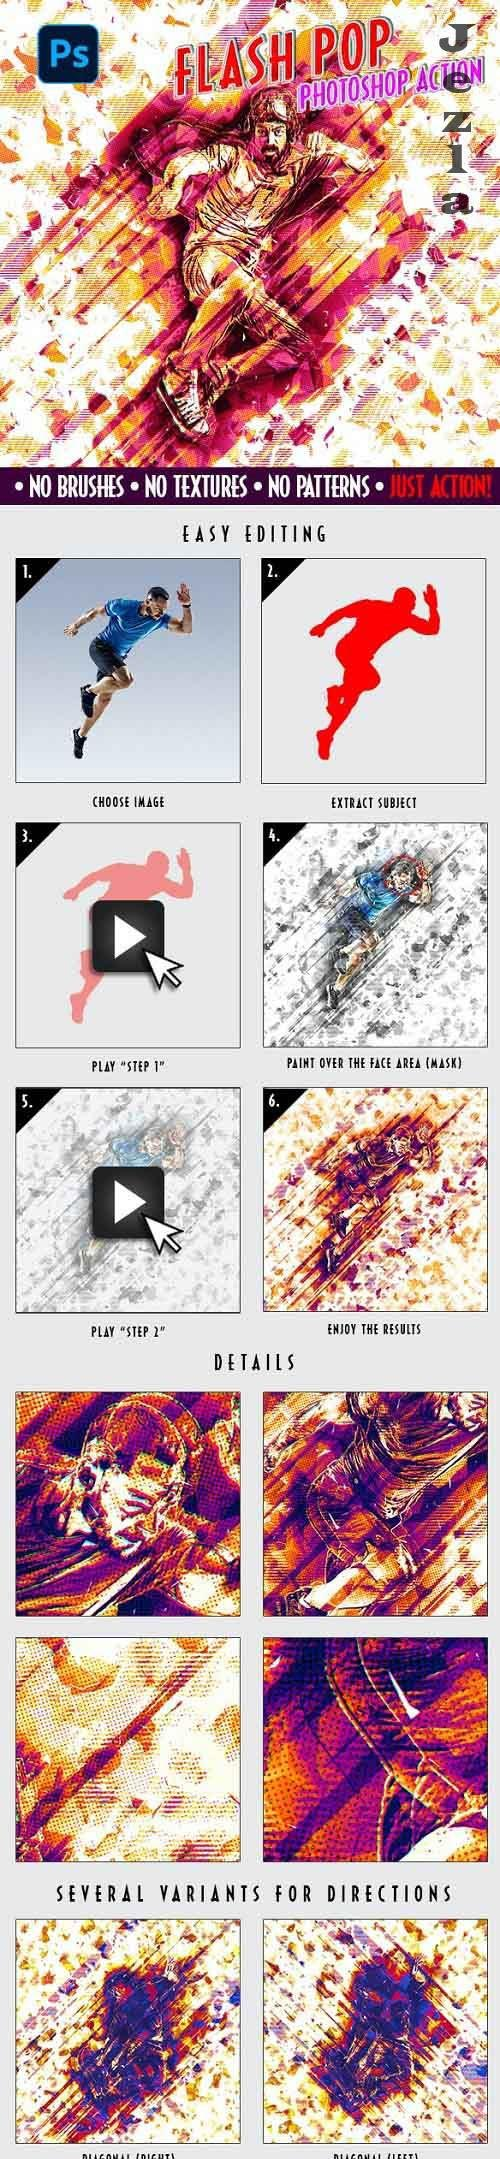 FLASH POP | Pop Art-Action - 33821594